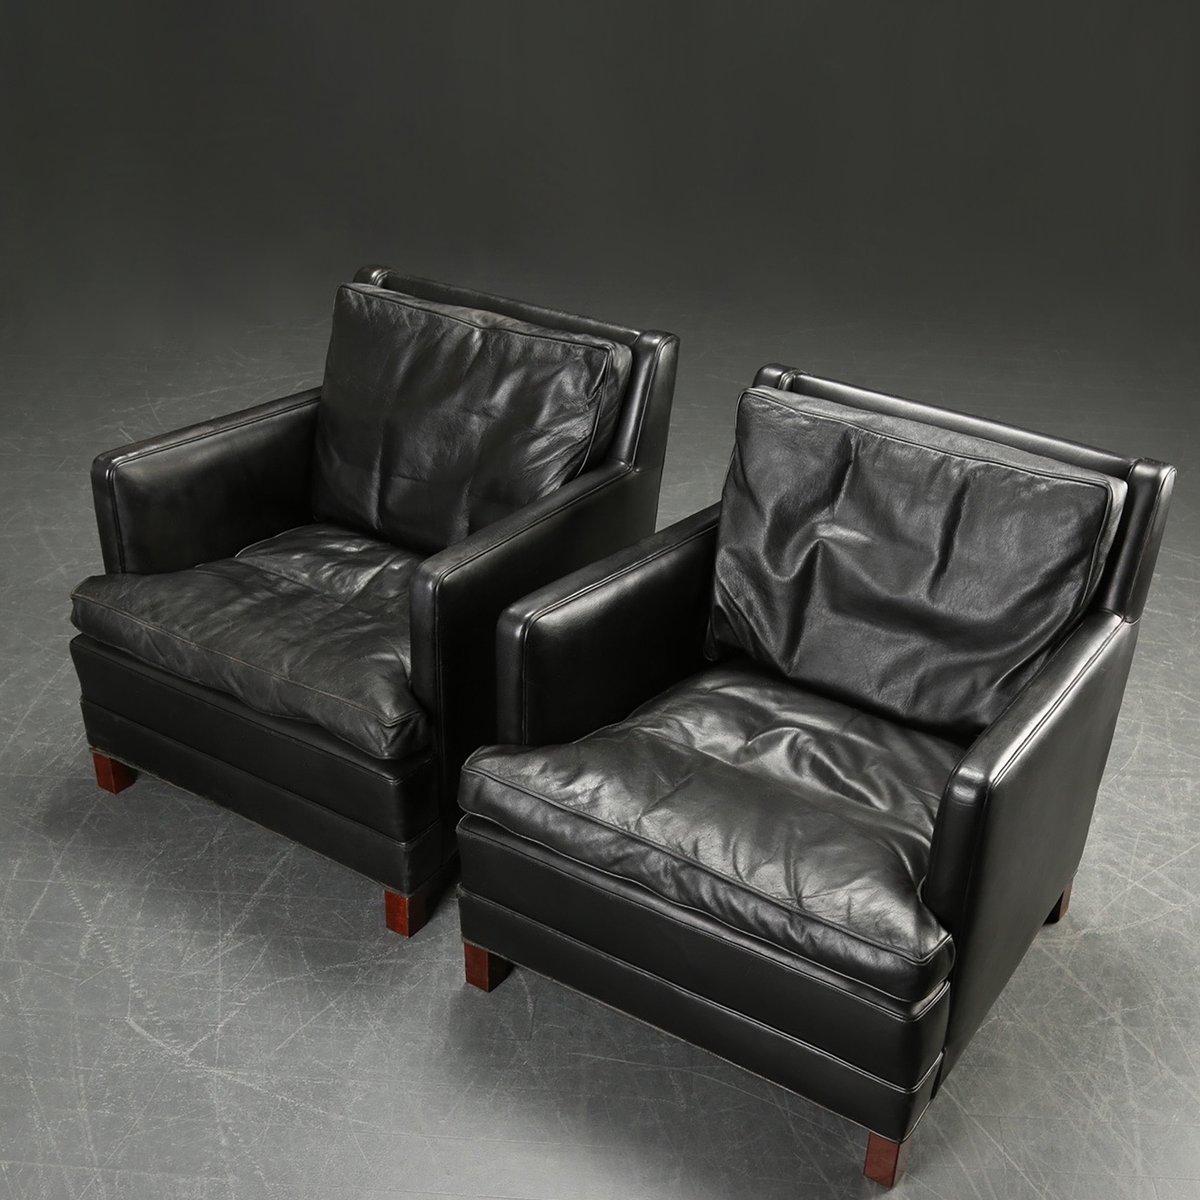 D nische sessel aus schwarzem leder von borge mogensen for Sessel aus leder